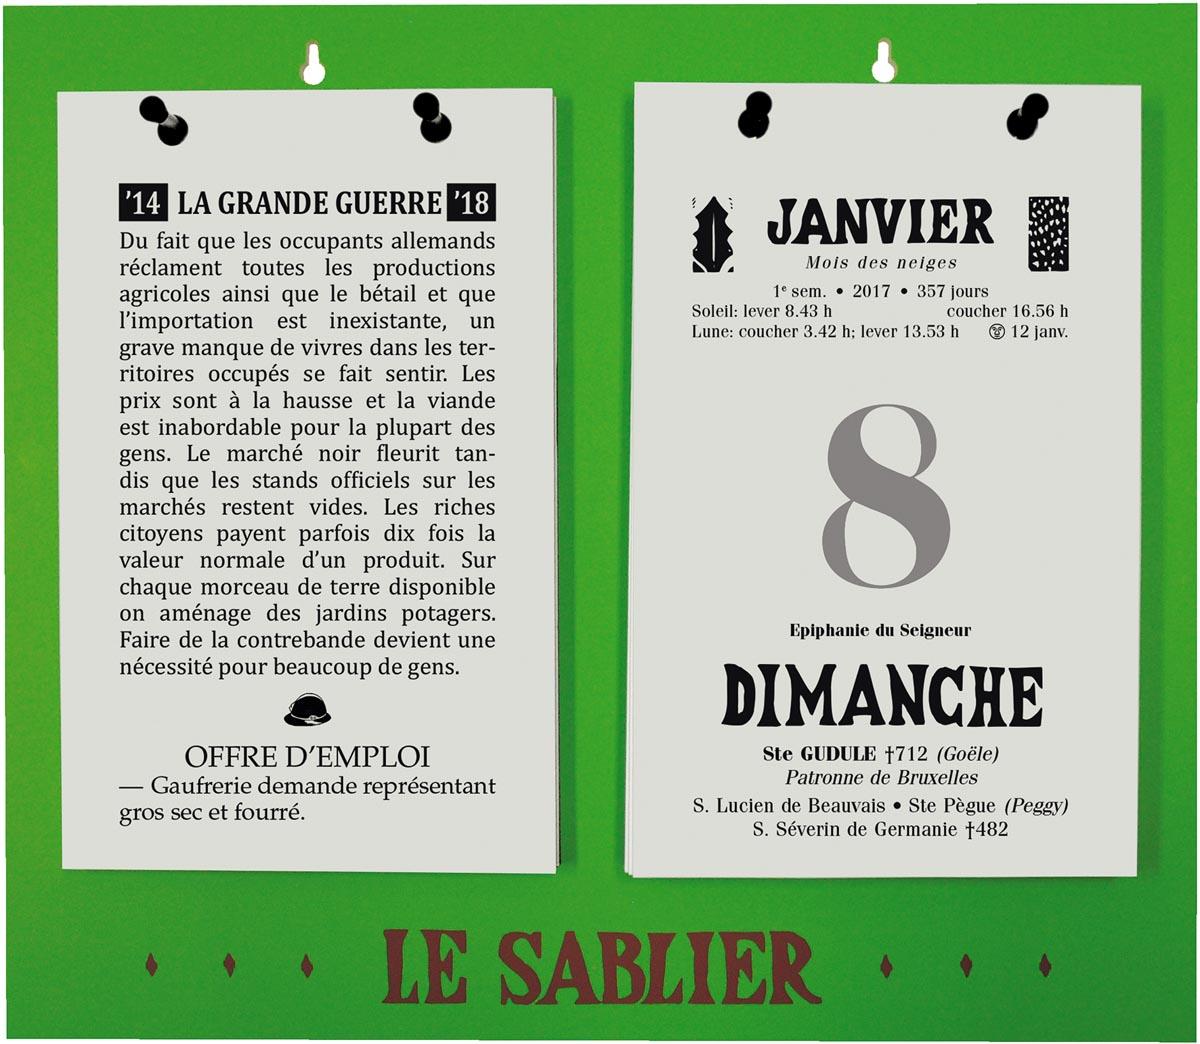 Rugplaat uit kunststof voor Le Sablier Géant, ft A4